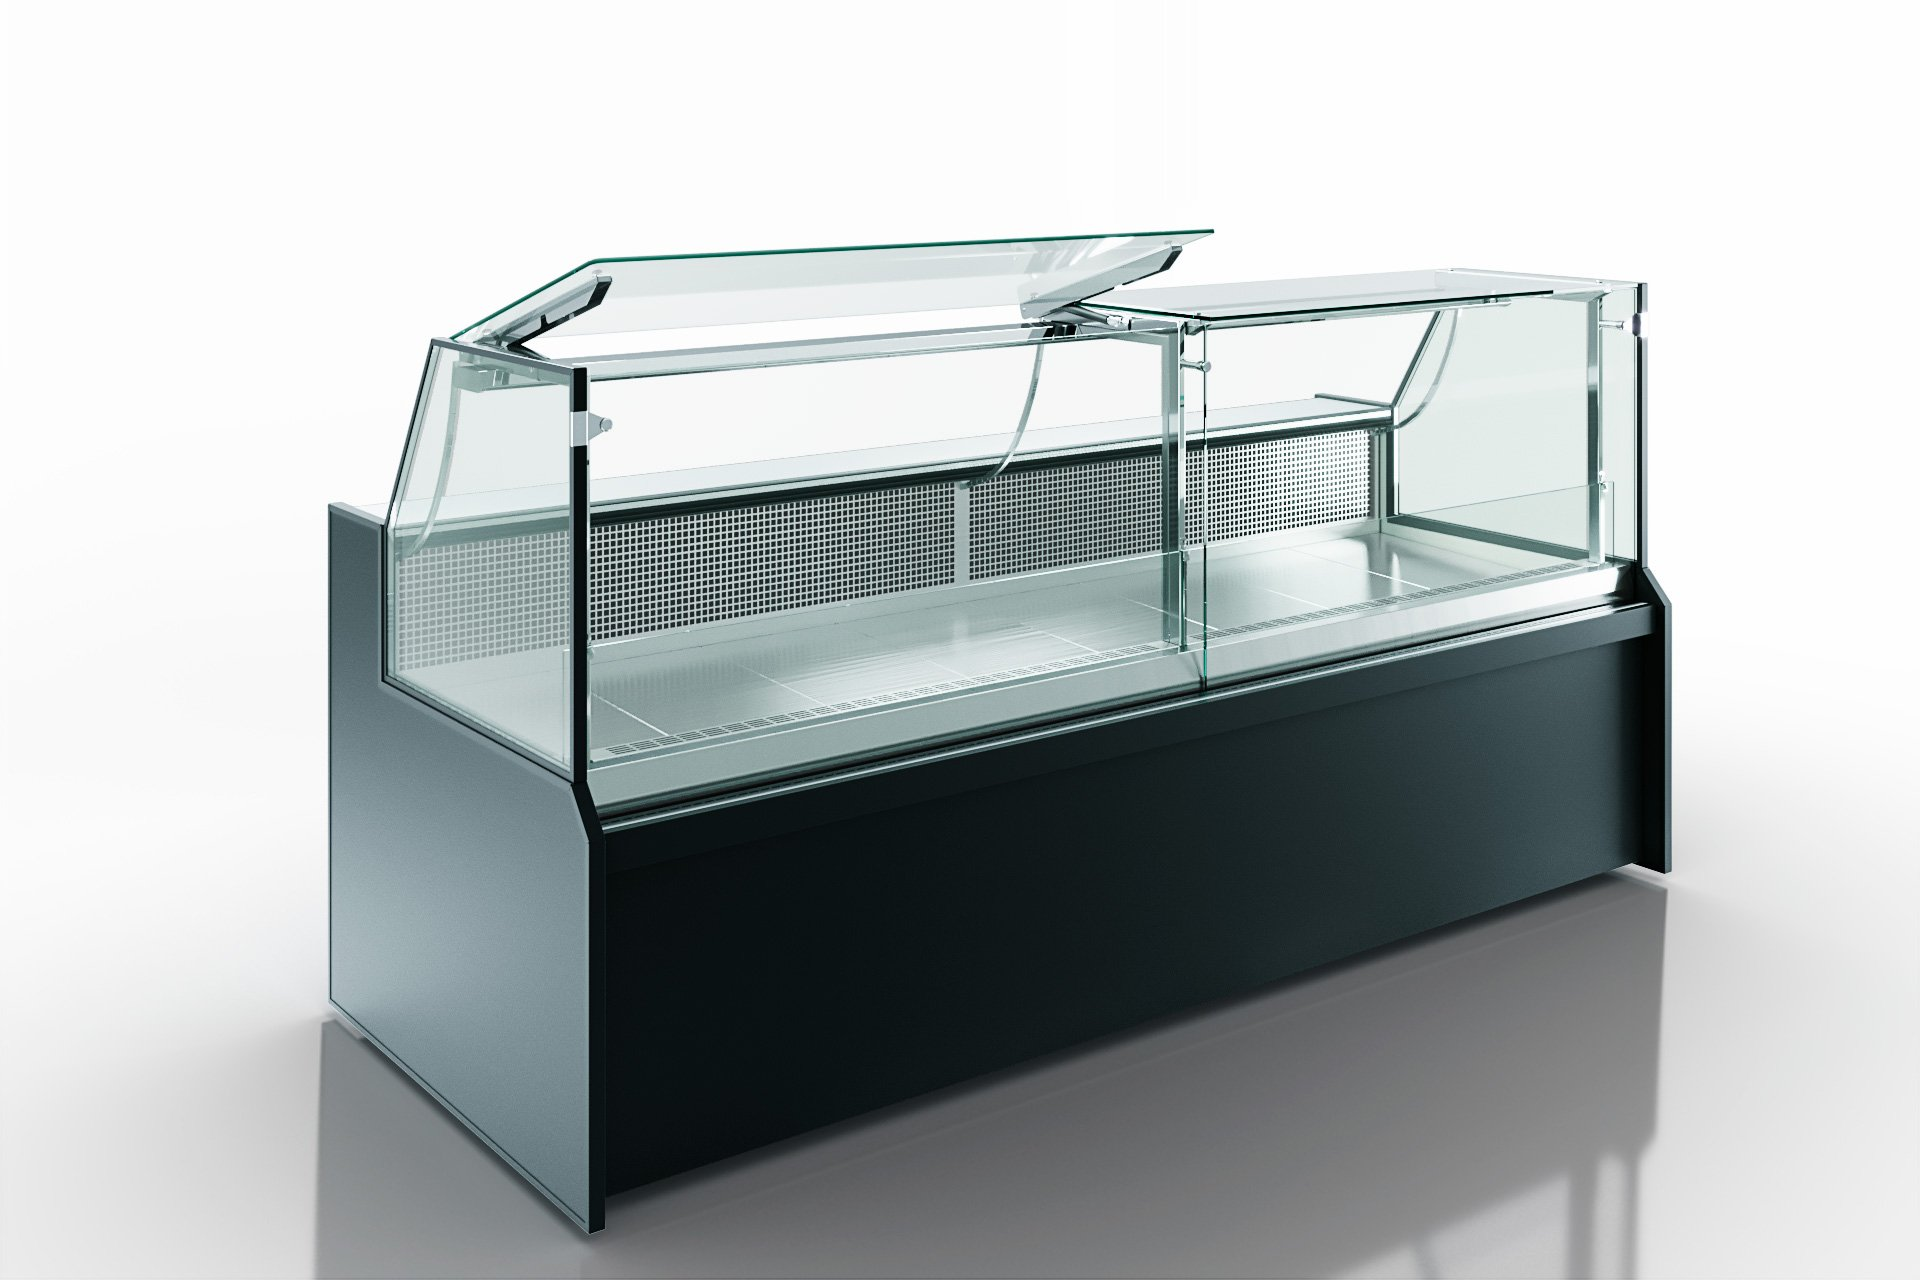 MISSOURI MC 100 MISSOURI MC 100 DELI PP/SELF M/A